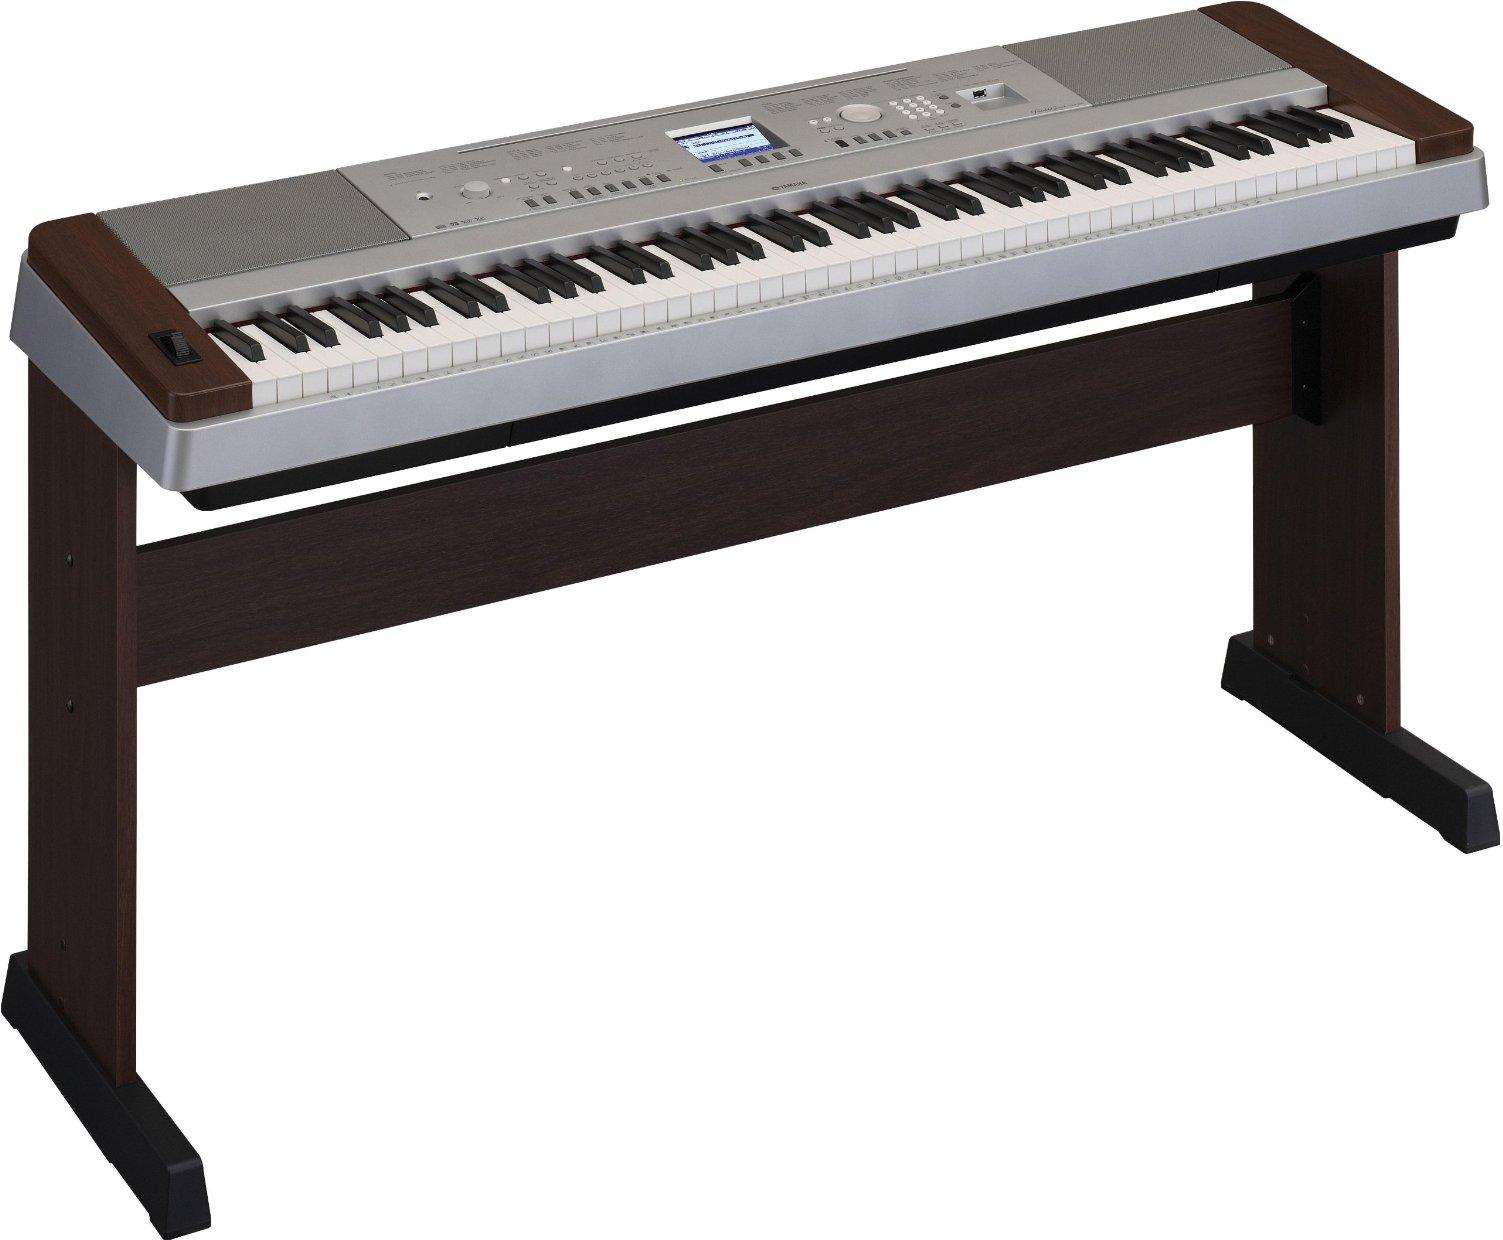 yamaha dgx640w digital piano review. Black Bedroom Furniture Sets. Home Design Ideas